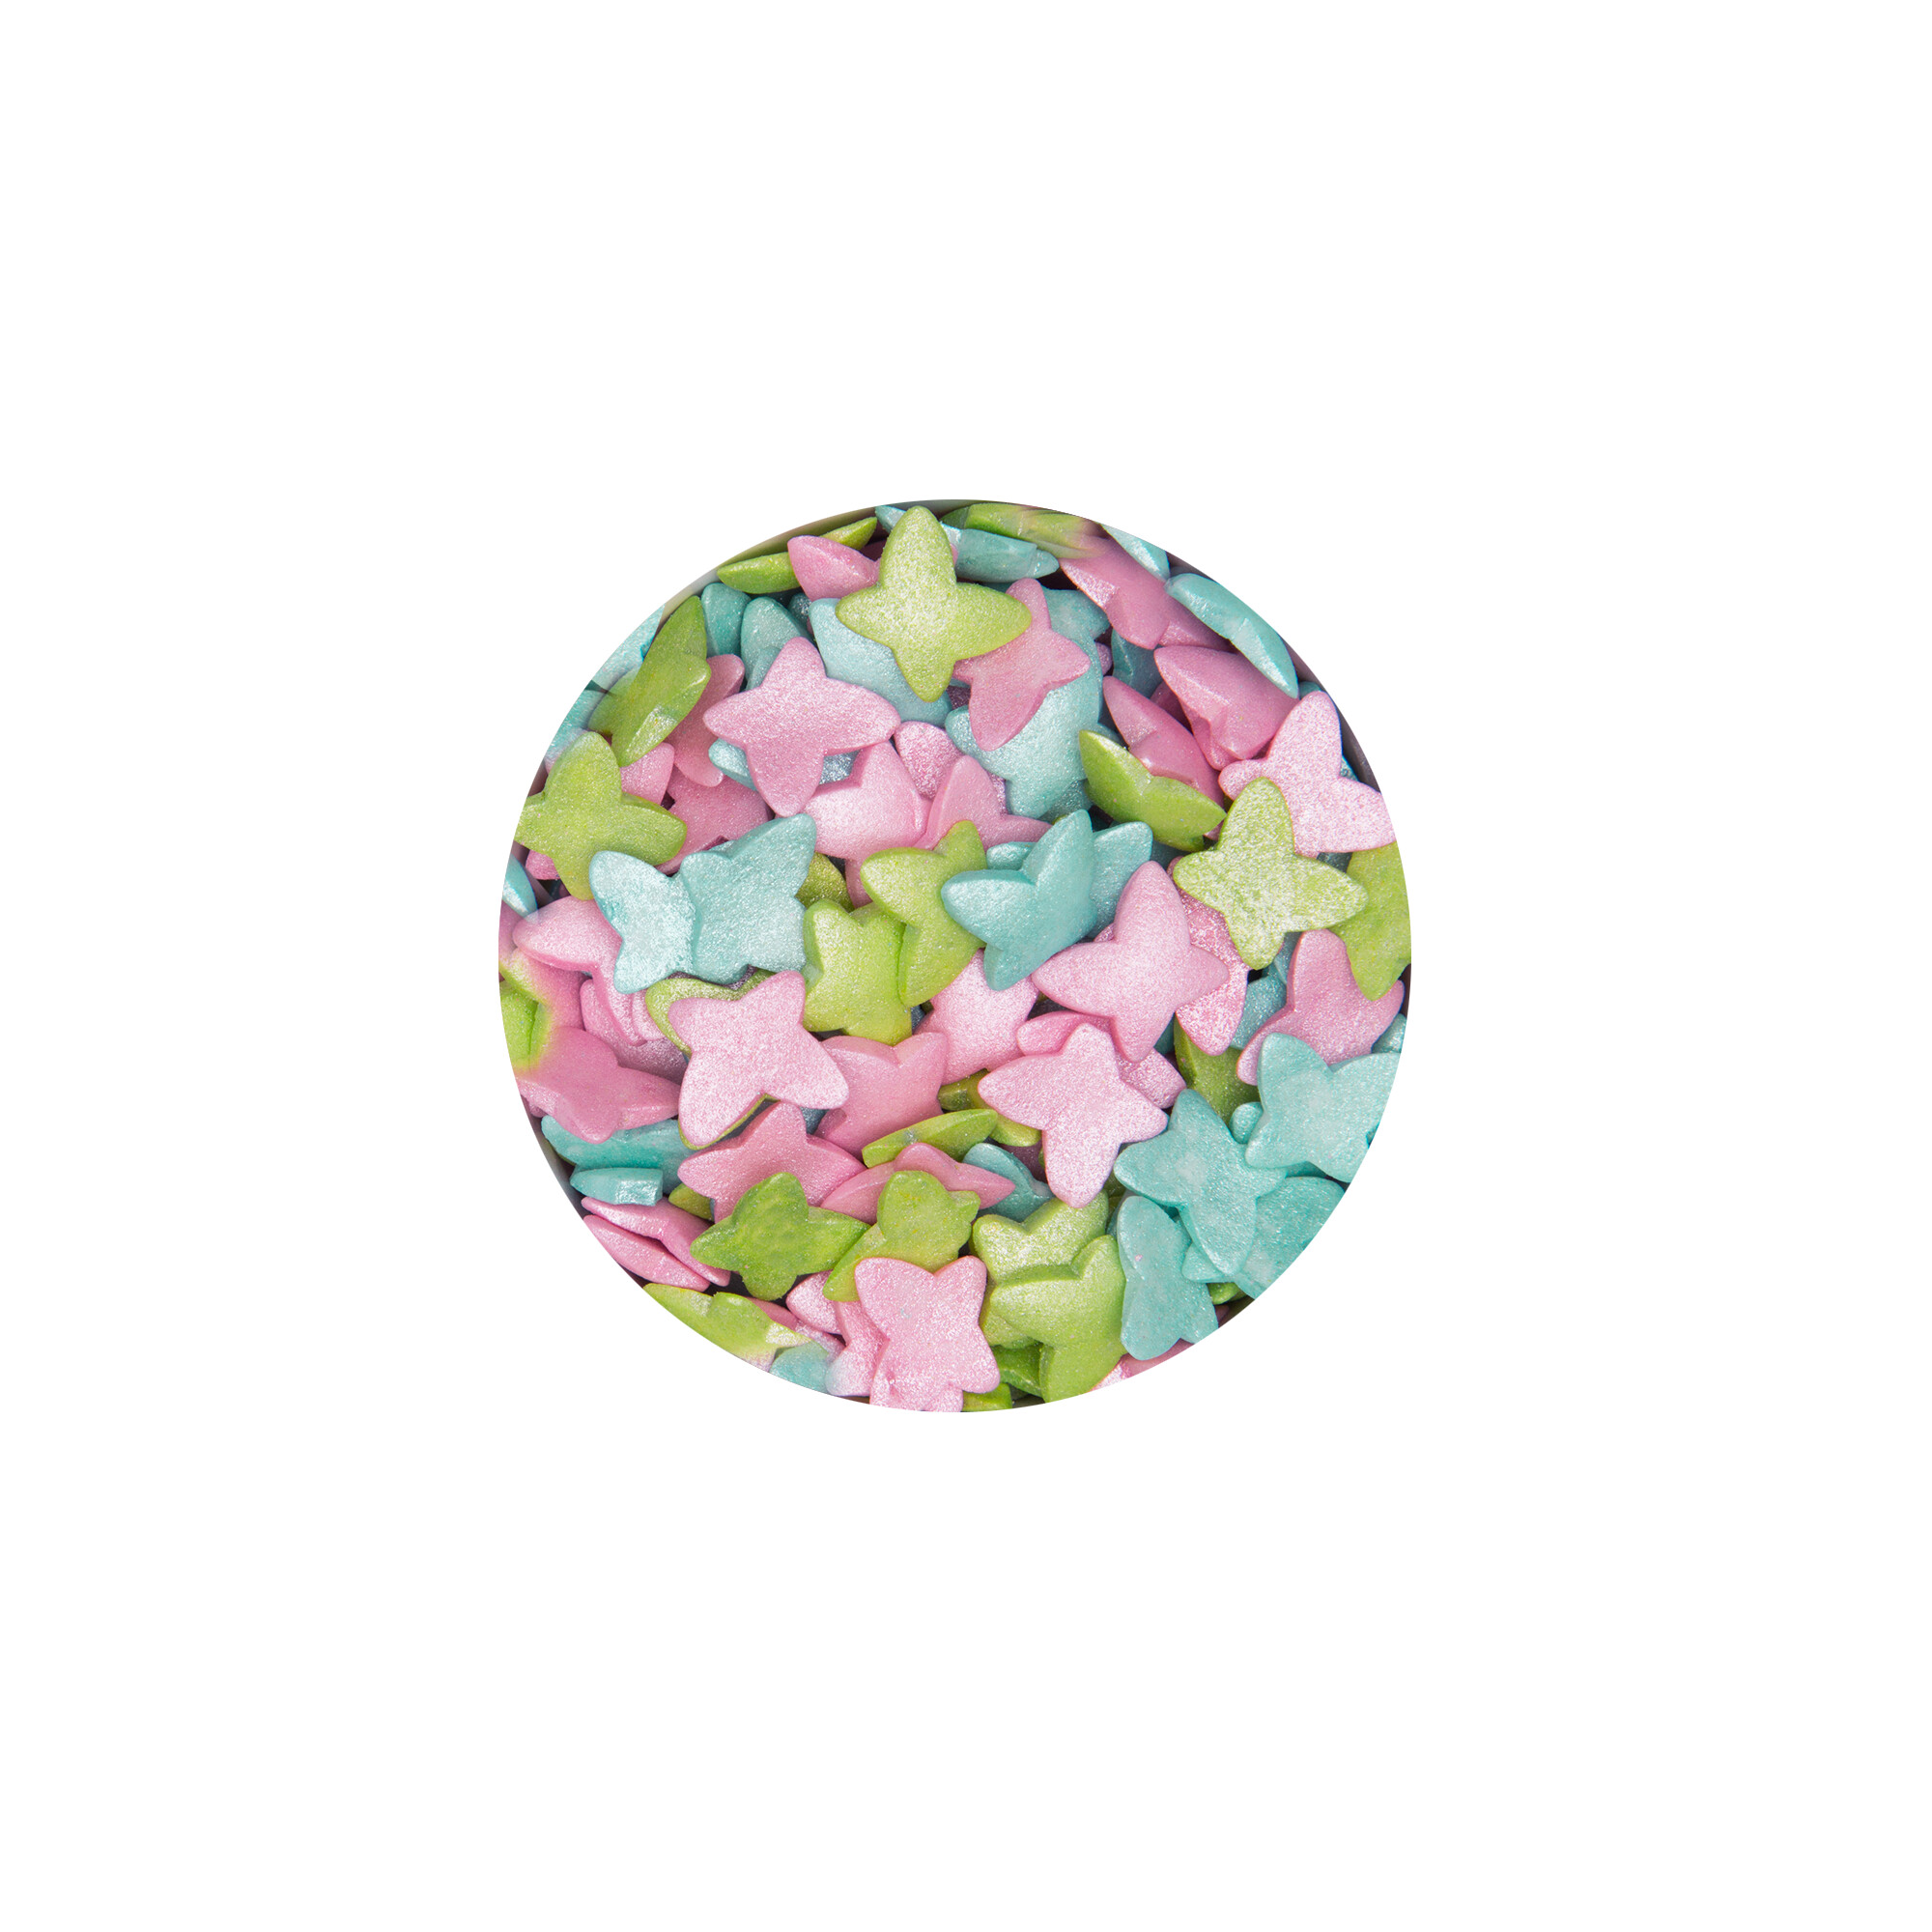 Essbarer Streudekor - Schmetterlinge